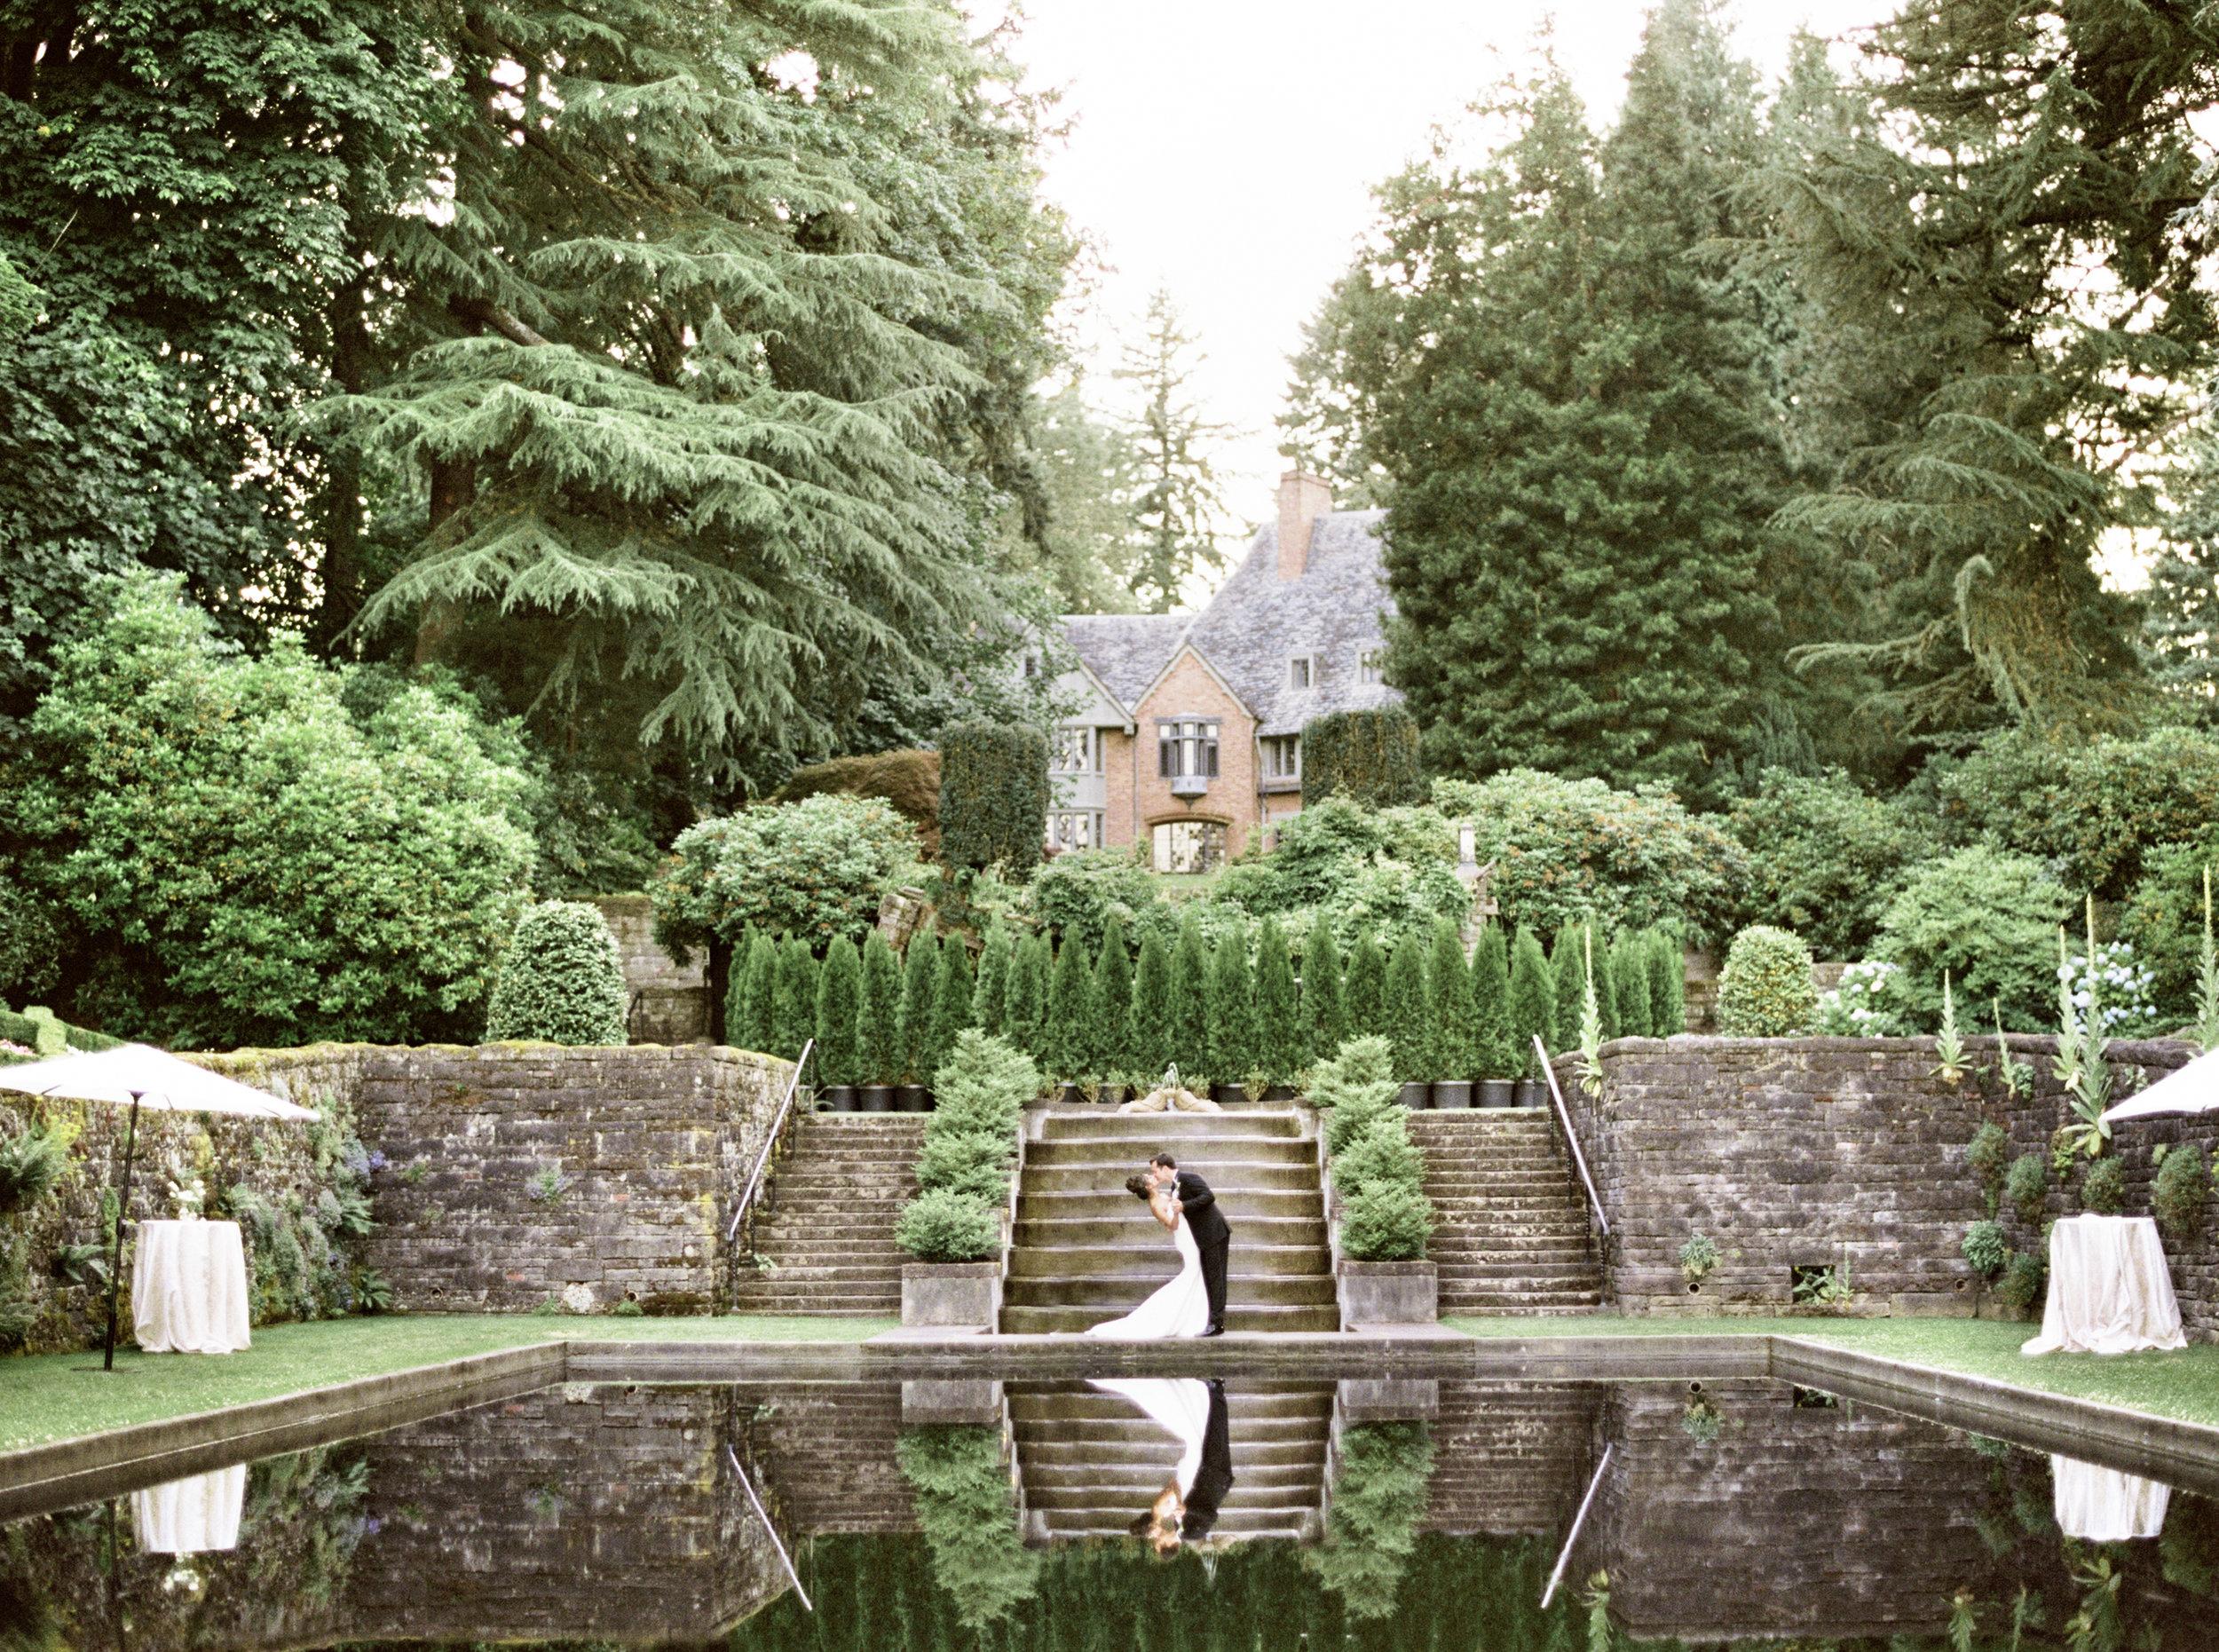 BLACK -TIE DESTINATION WEDDING • LEWIS & CLARK • PORTLAND, OR